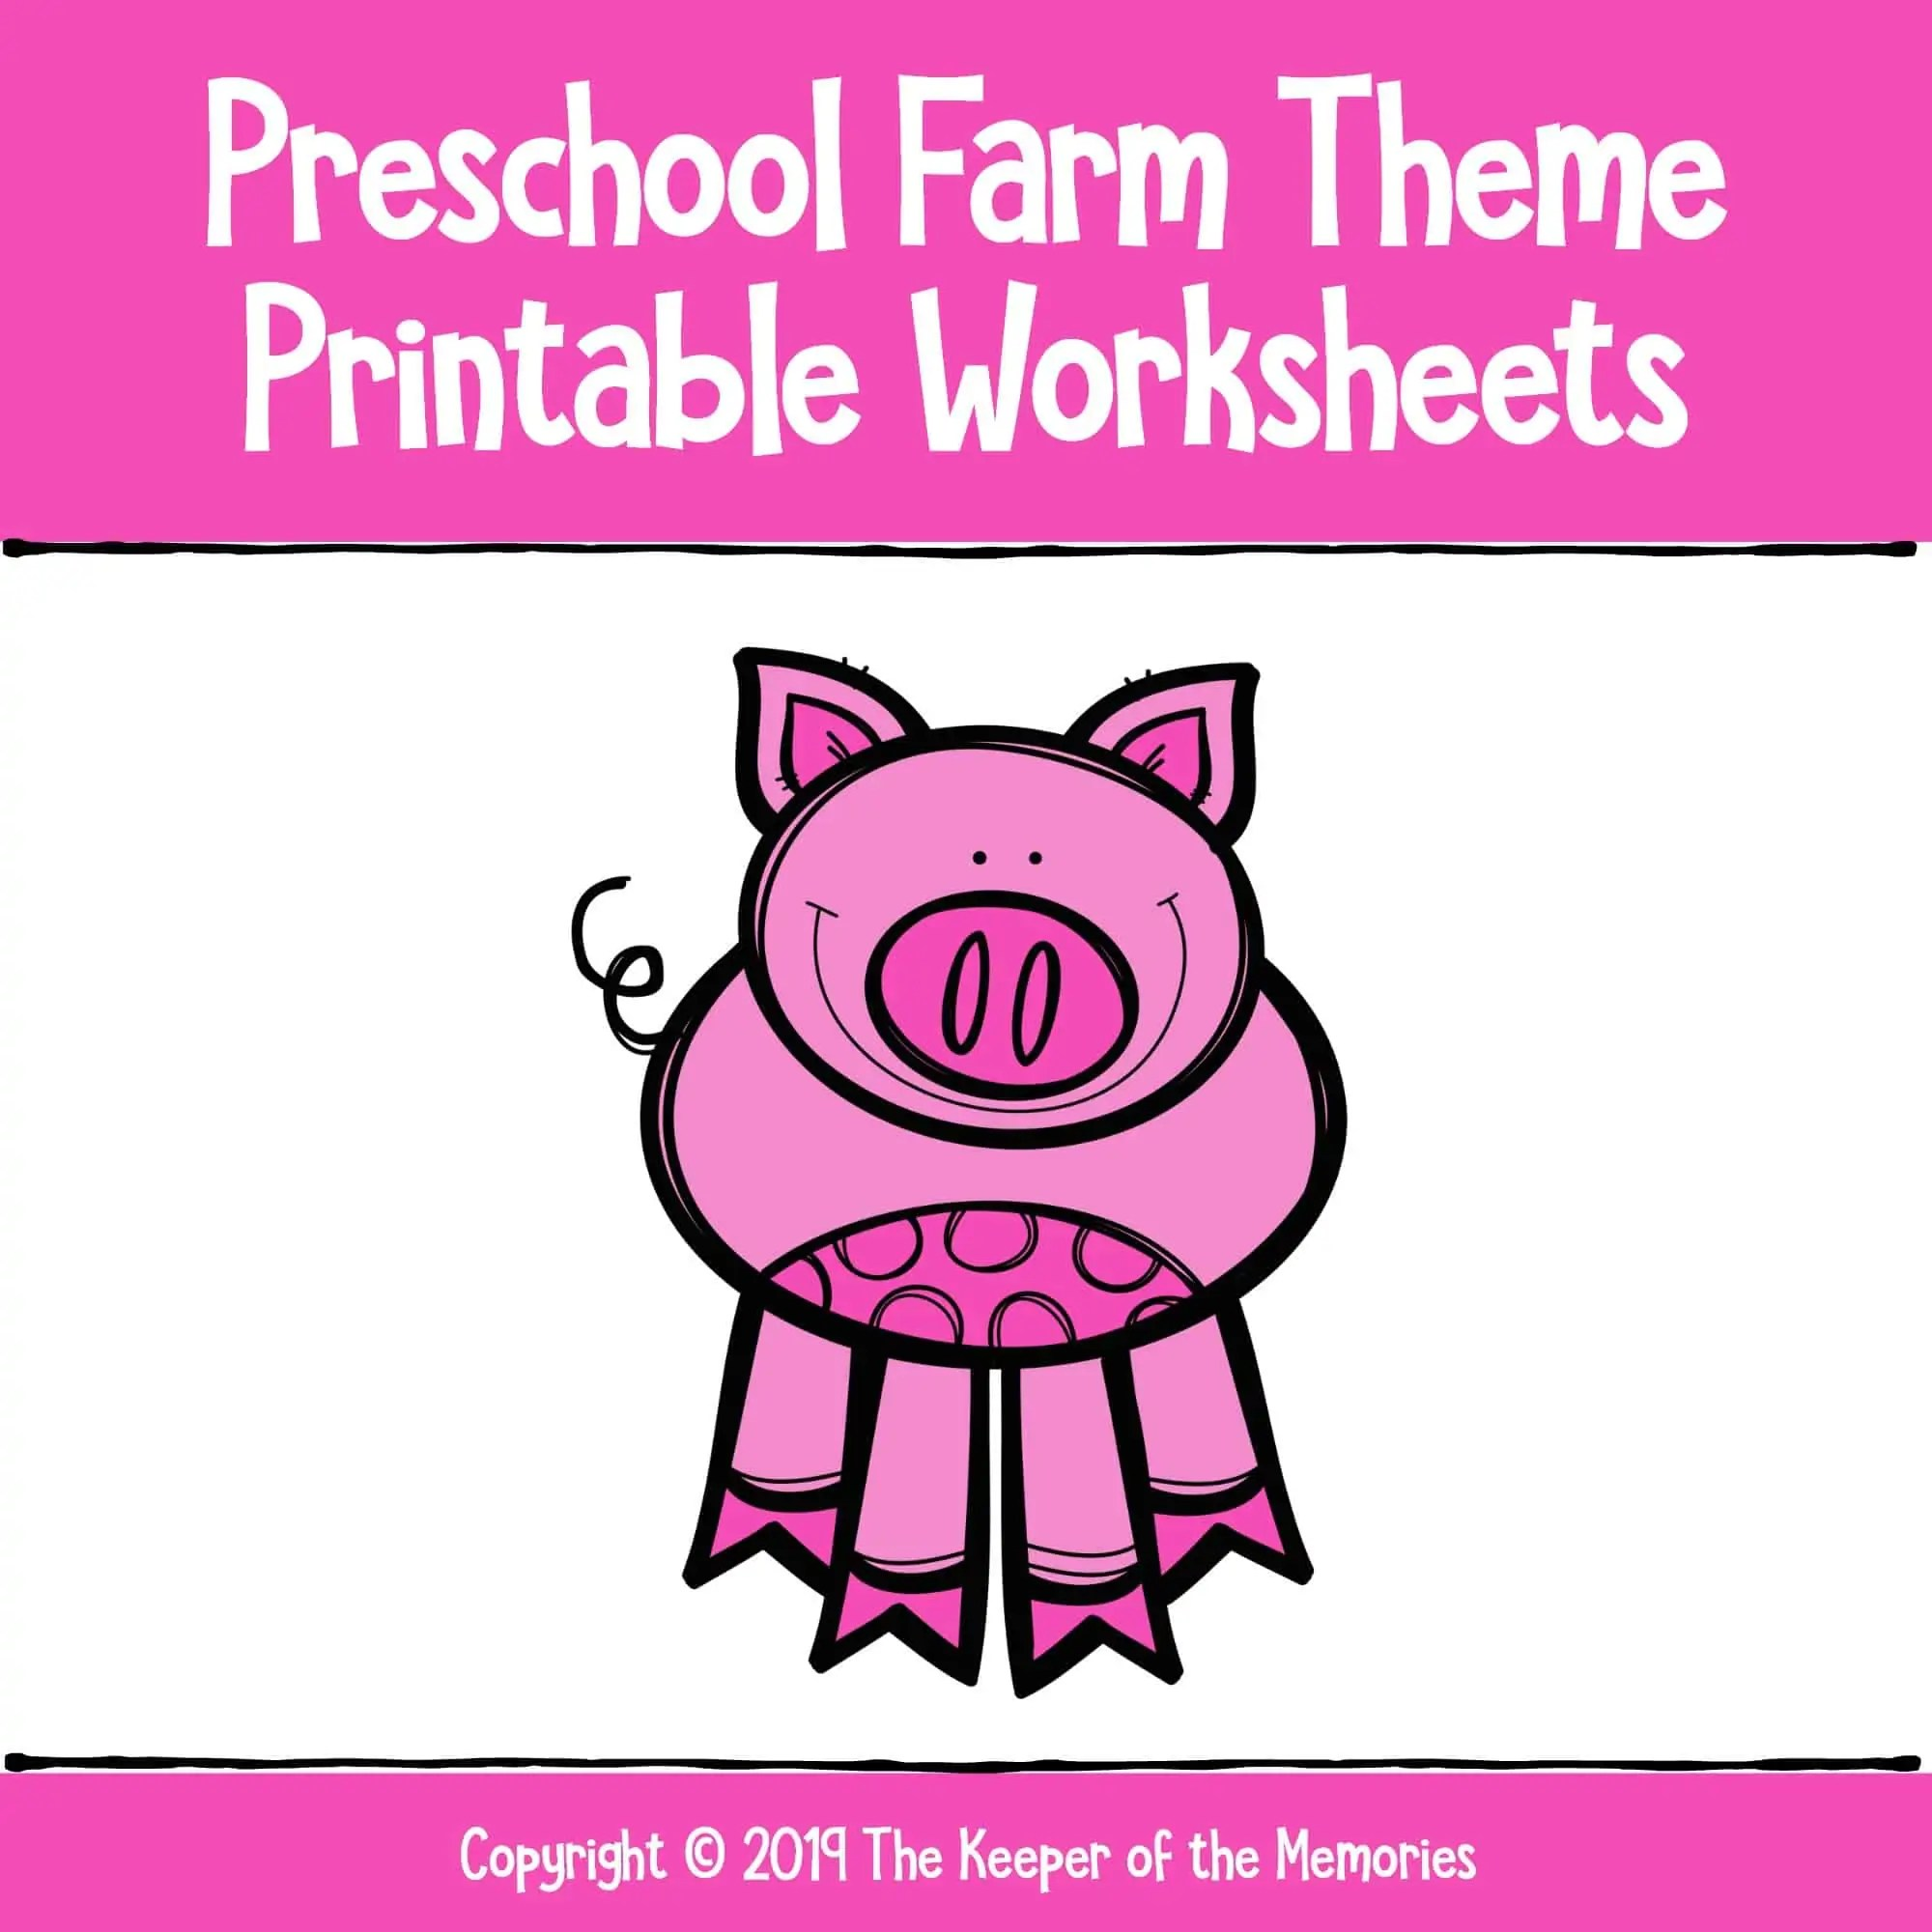 Preschool Farm Theme Printable Worksheets Cover